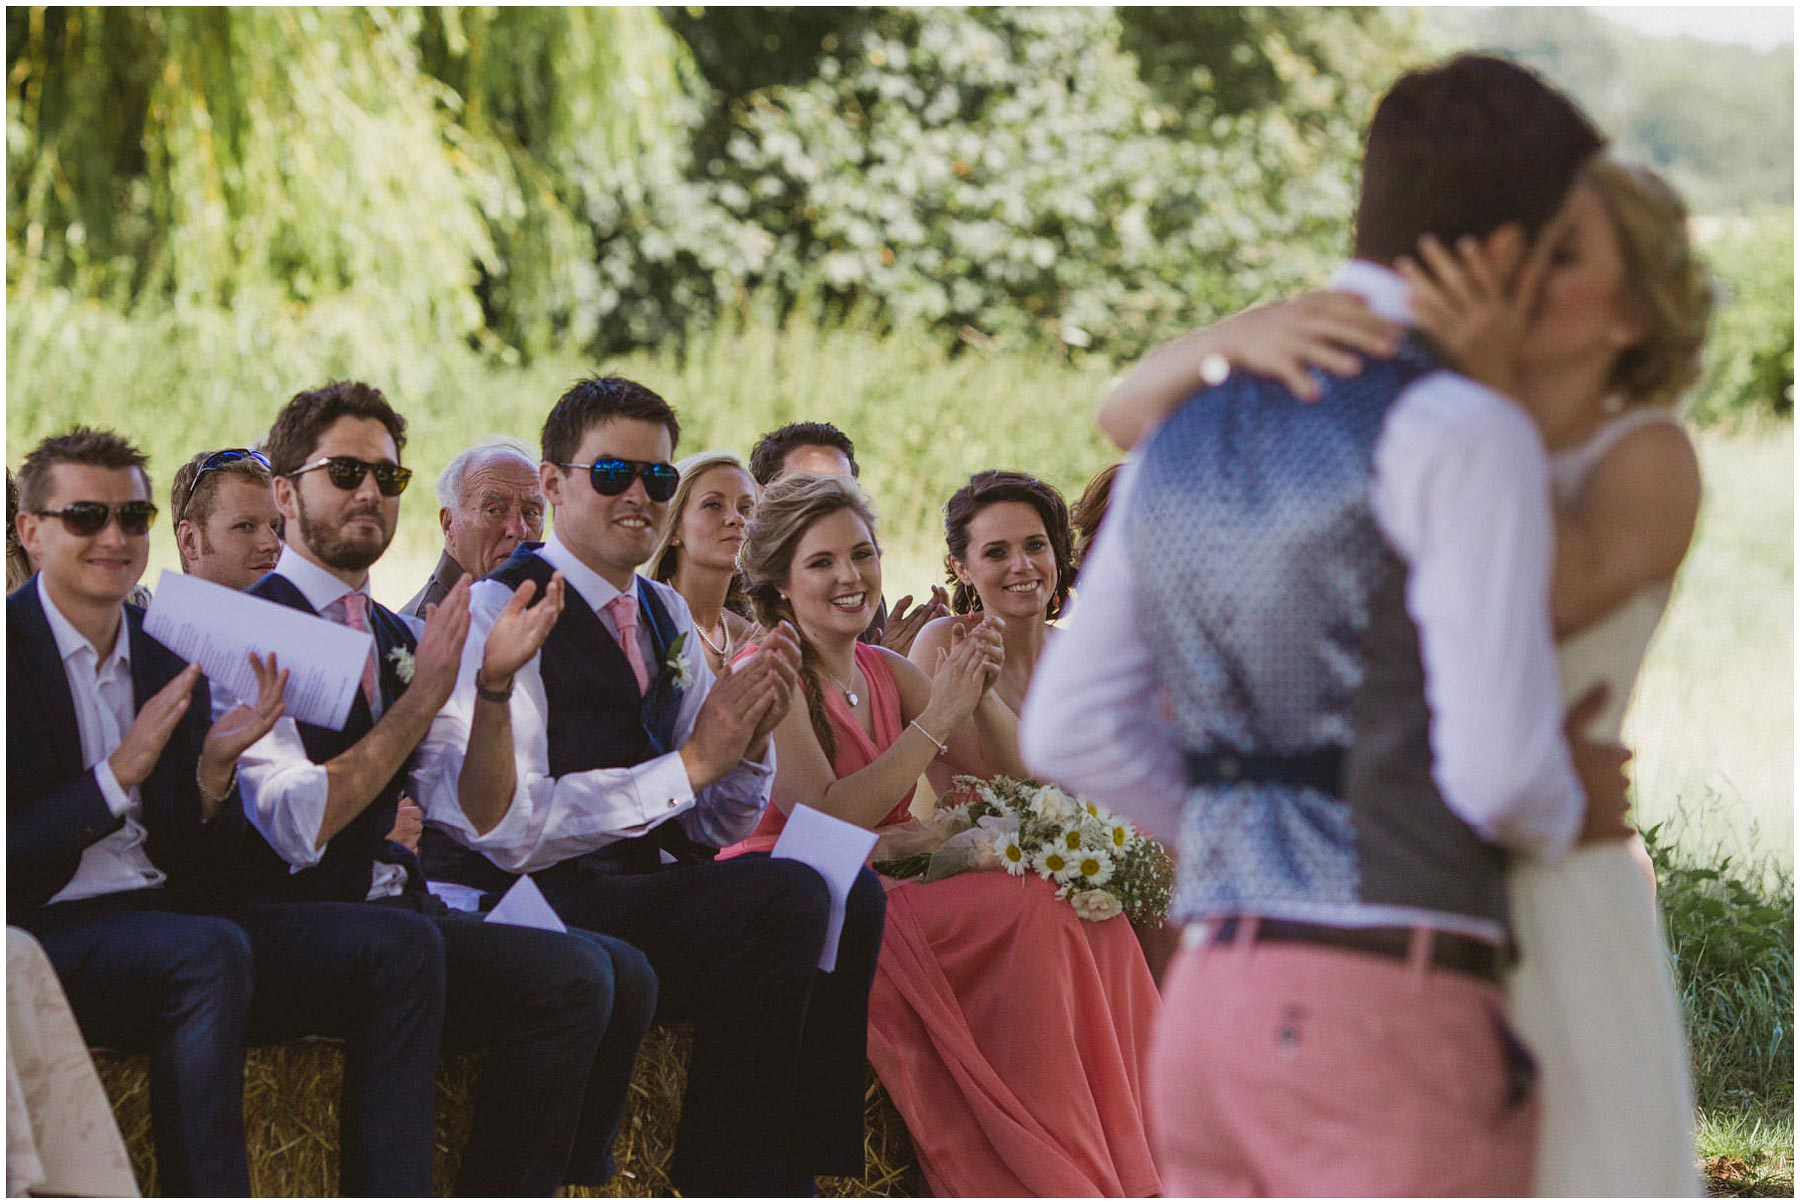 Festival Tipi Wedding Ceremony